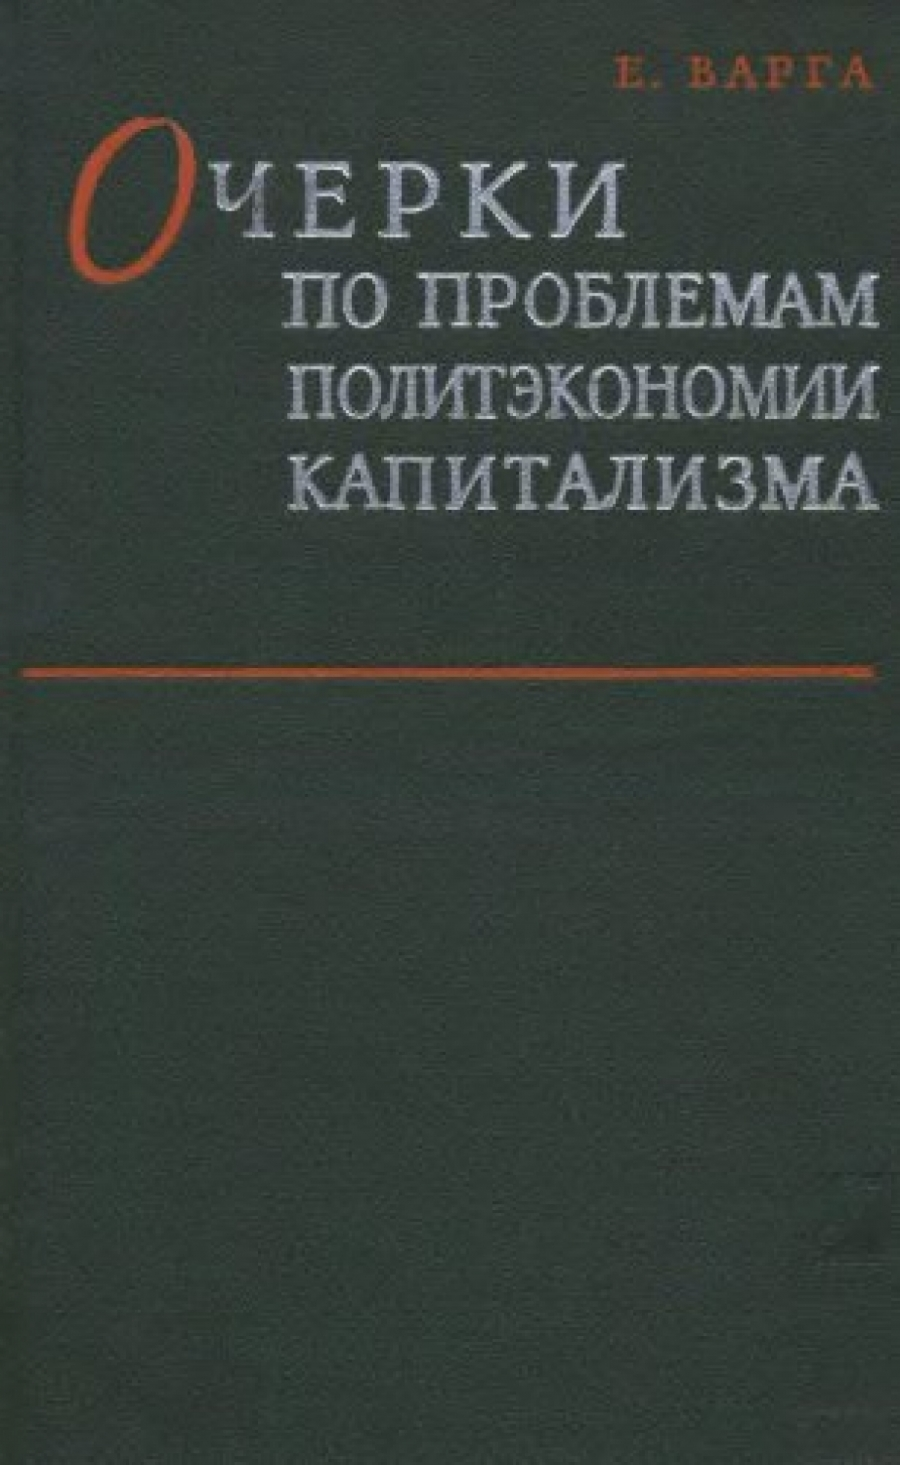 Обложка книги:  варга е.с. - очерки по проблемам политэкономии капитализма